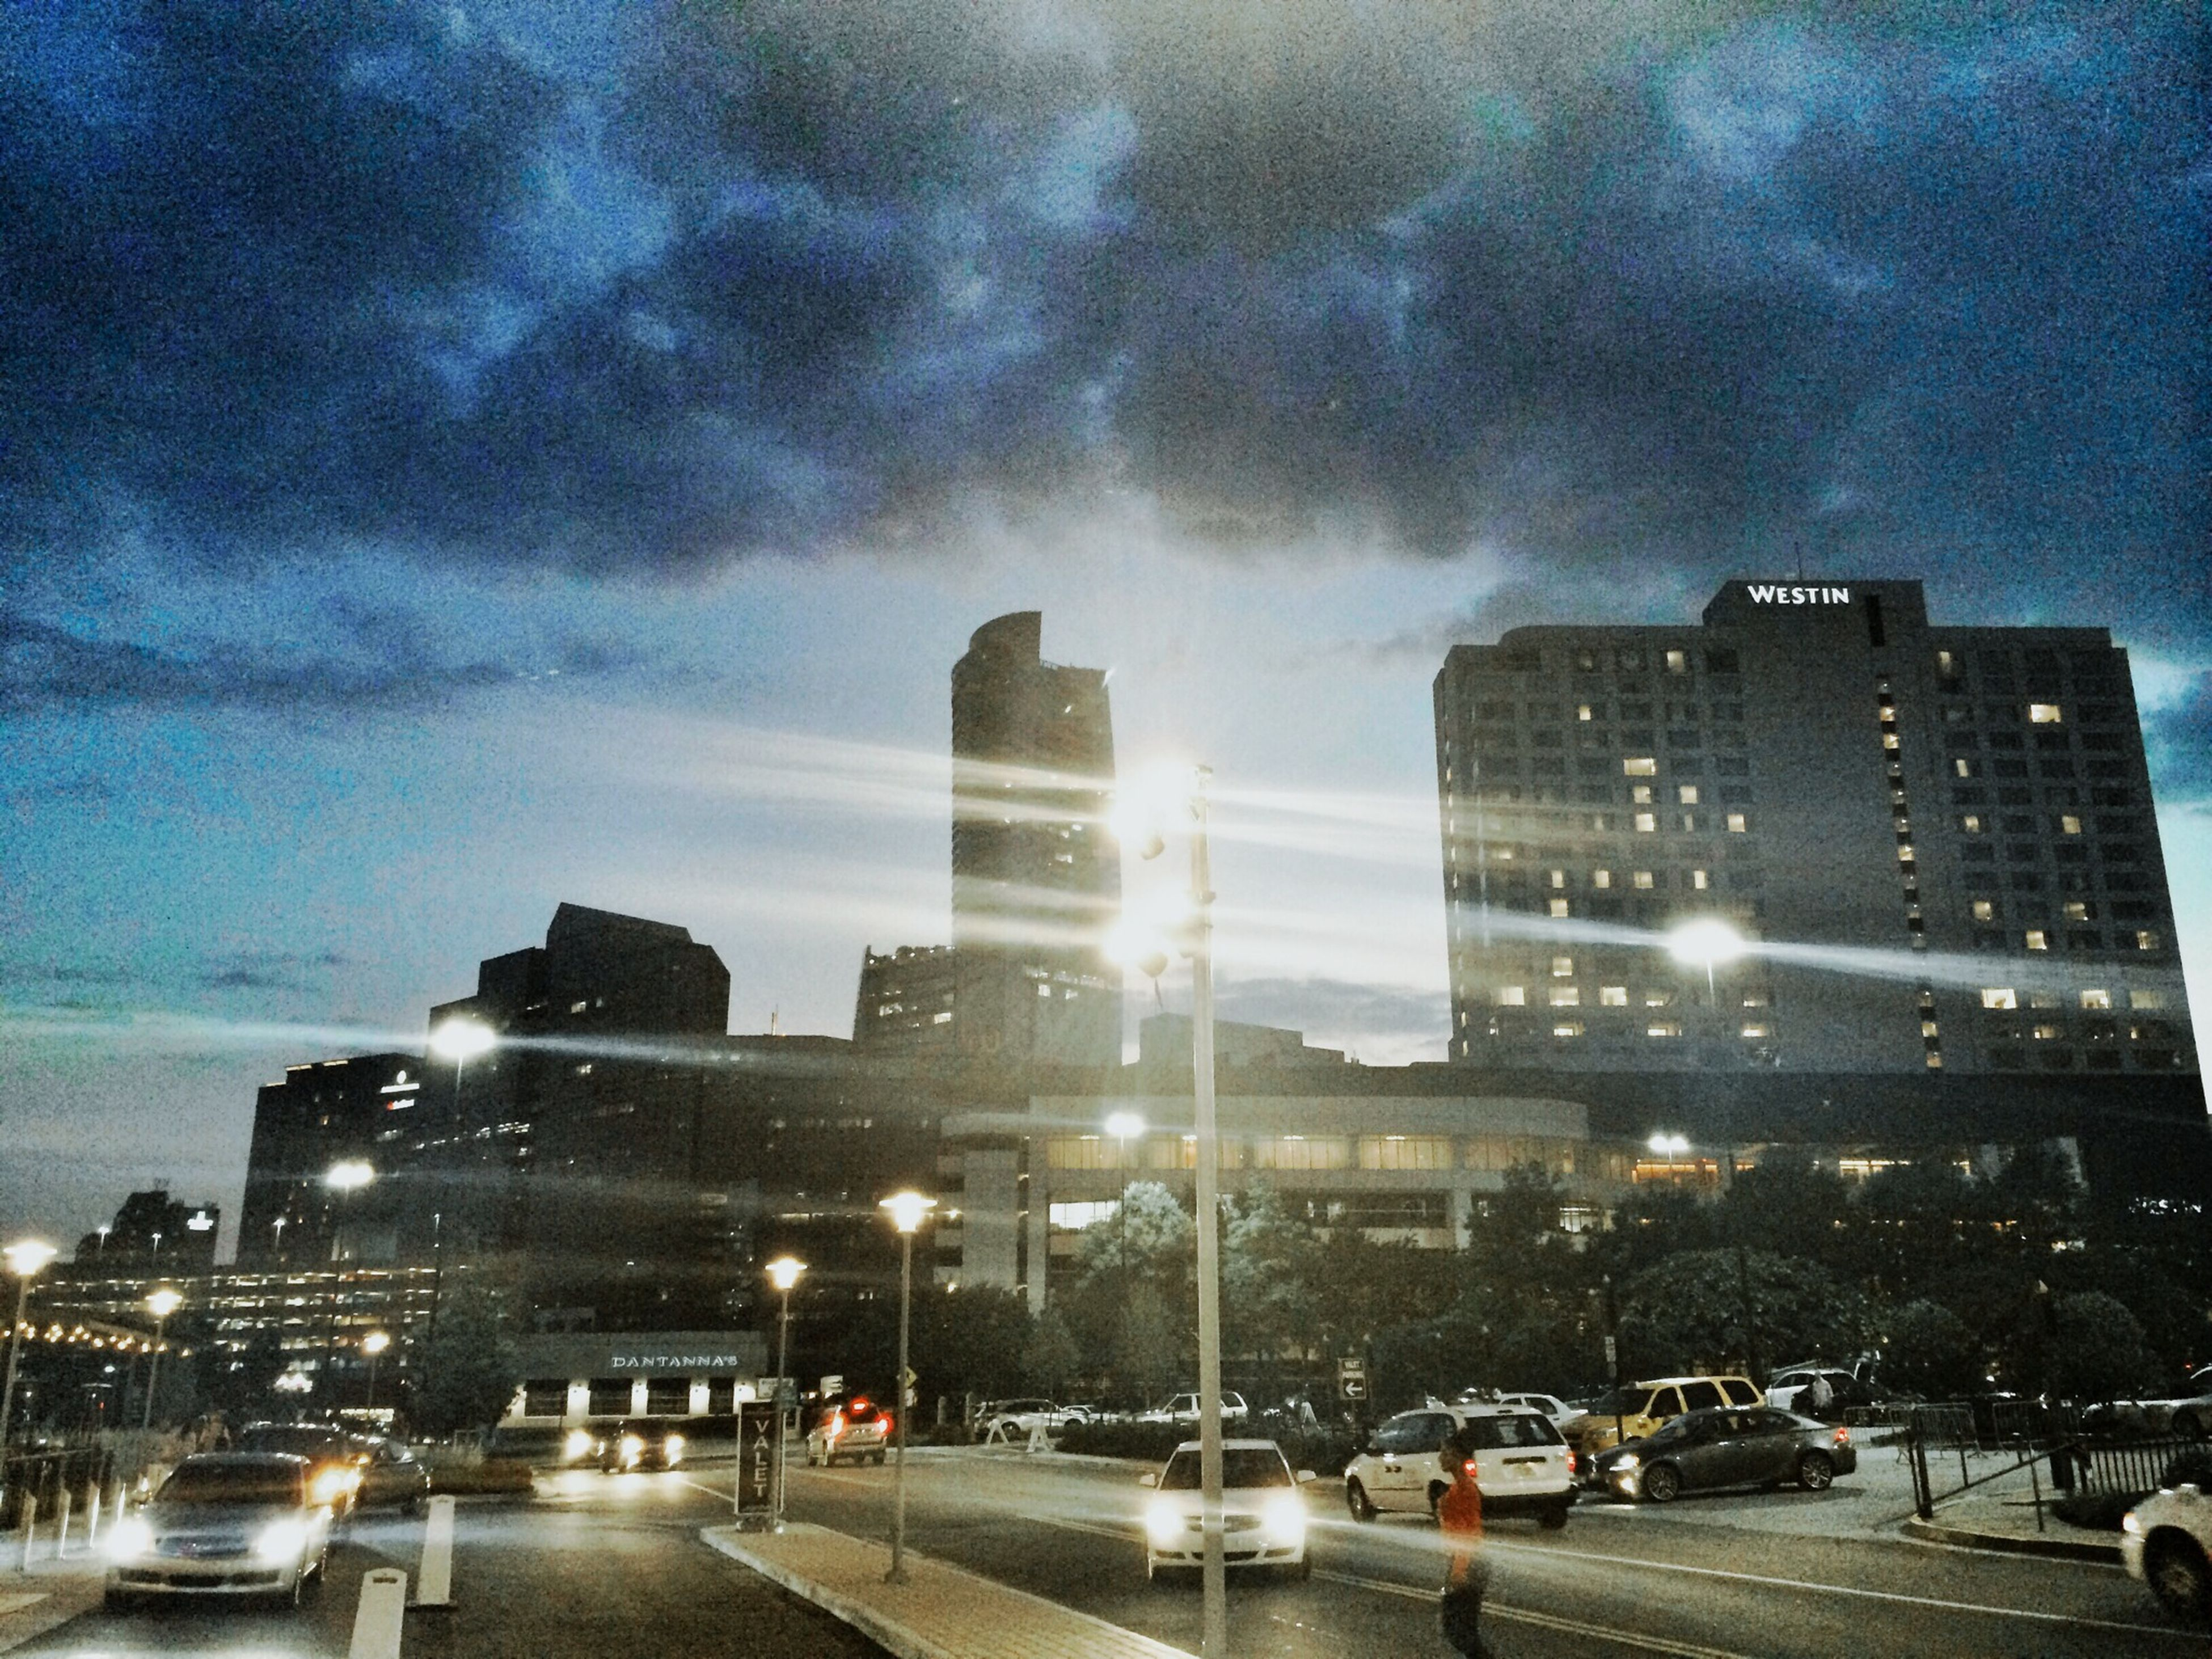 building exterior, architecture, built structure, sky, city, car, land vehicle, transportation, cloud - sky, street, road, illuminated, mode of transport, city life, cloudy, night, cityscape, city street, street light, cloud